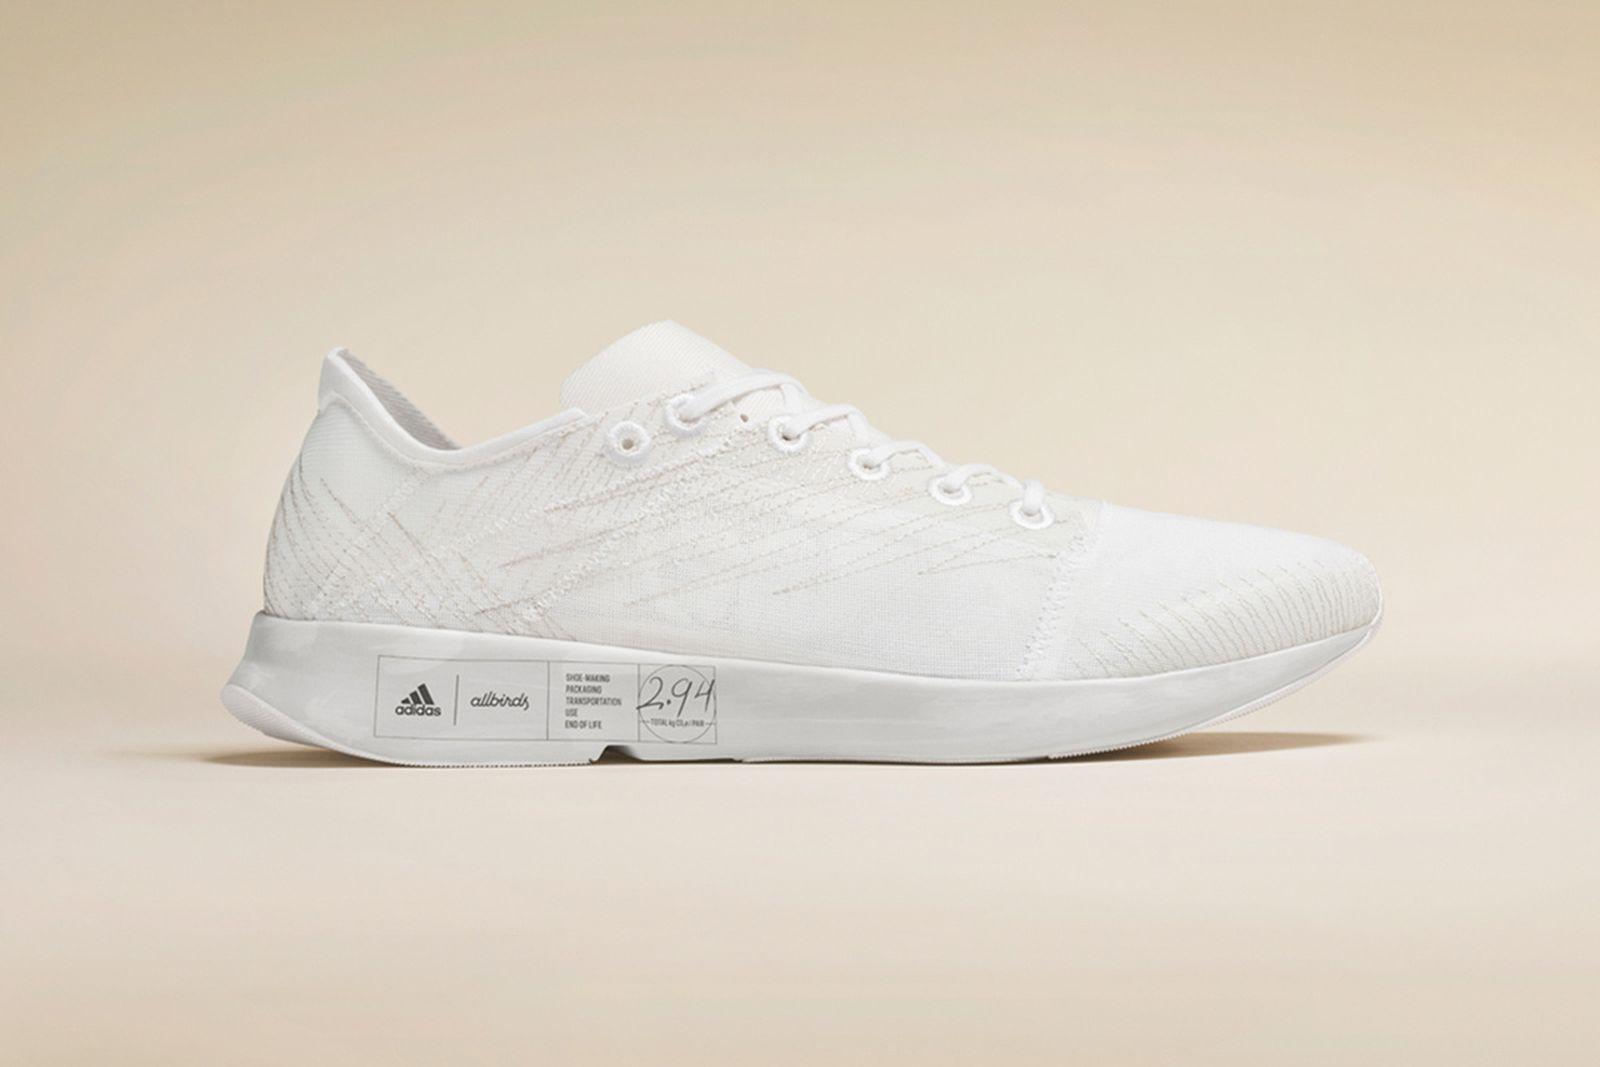 allbirds-adidas-futurecraft-footprint-release-date-price-05